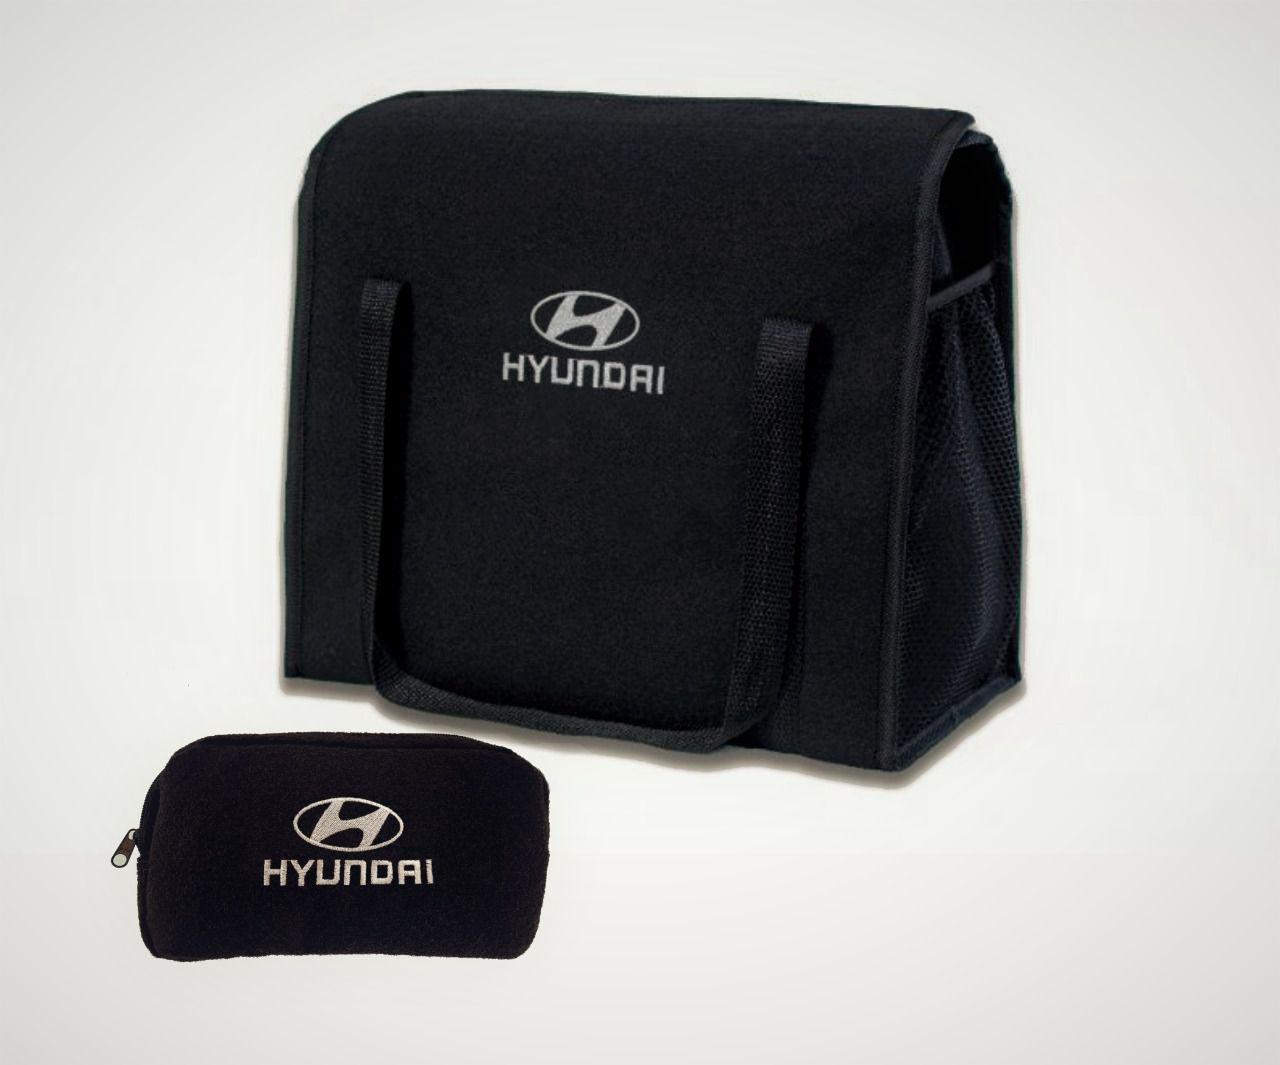 Kit Bolsa Organizadora Porta Malas e Necessaire Porta Luvas Hyundai